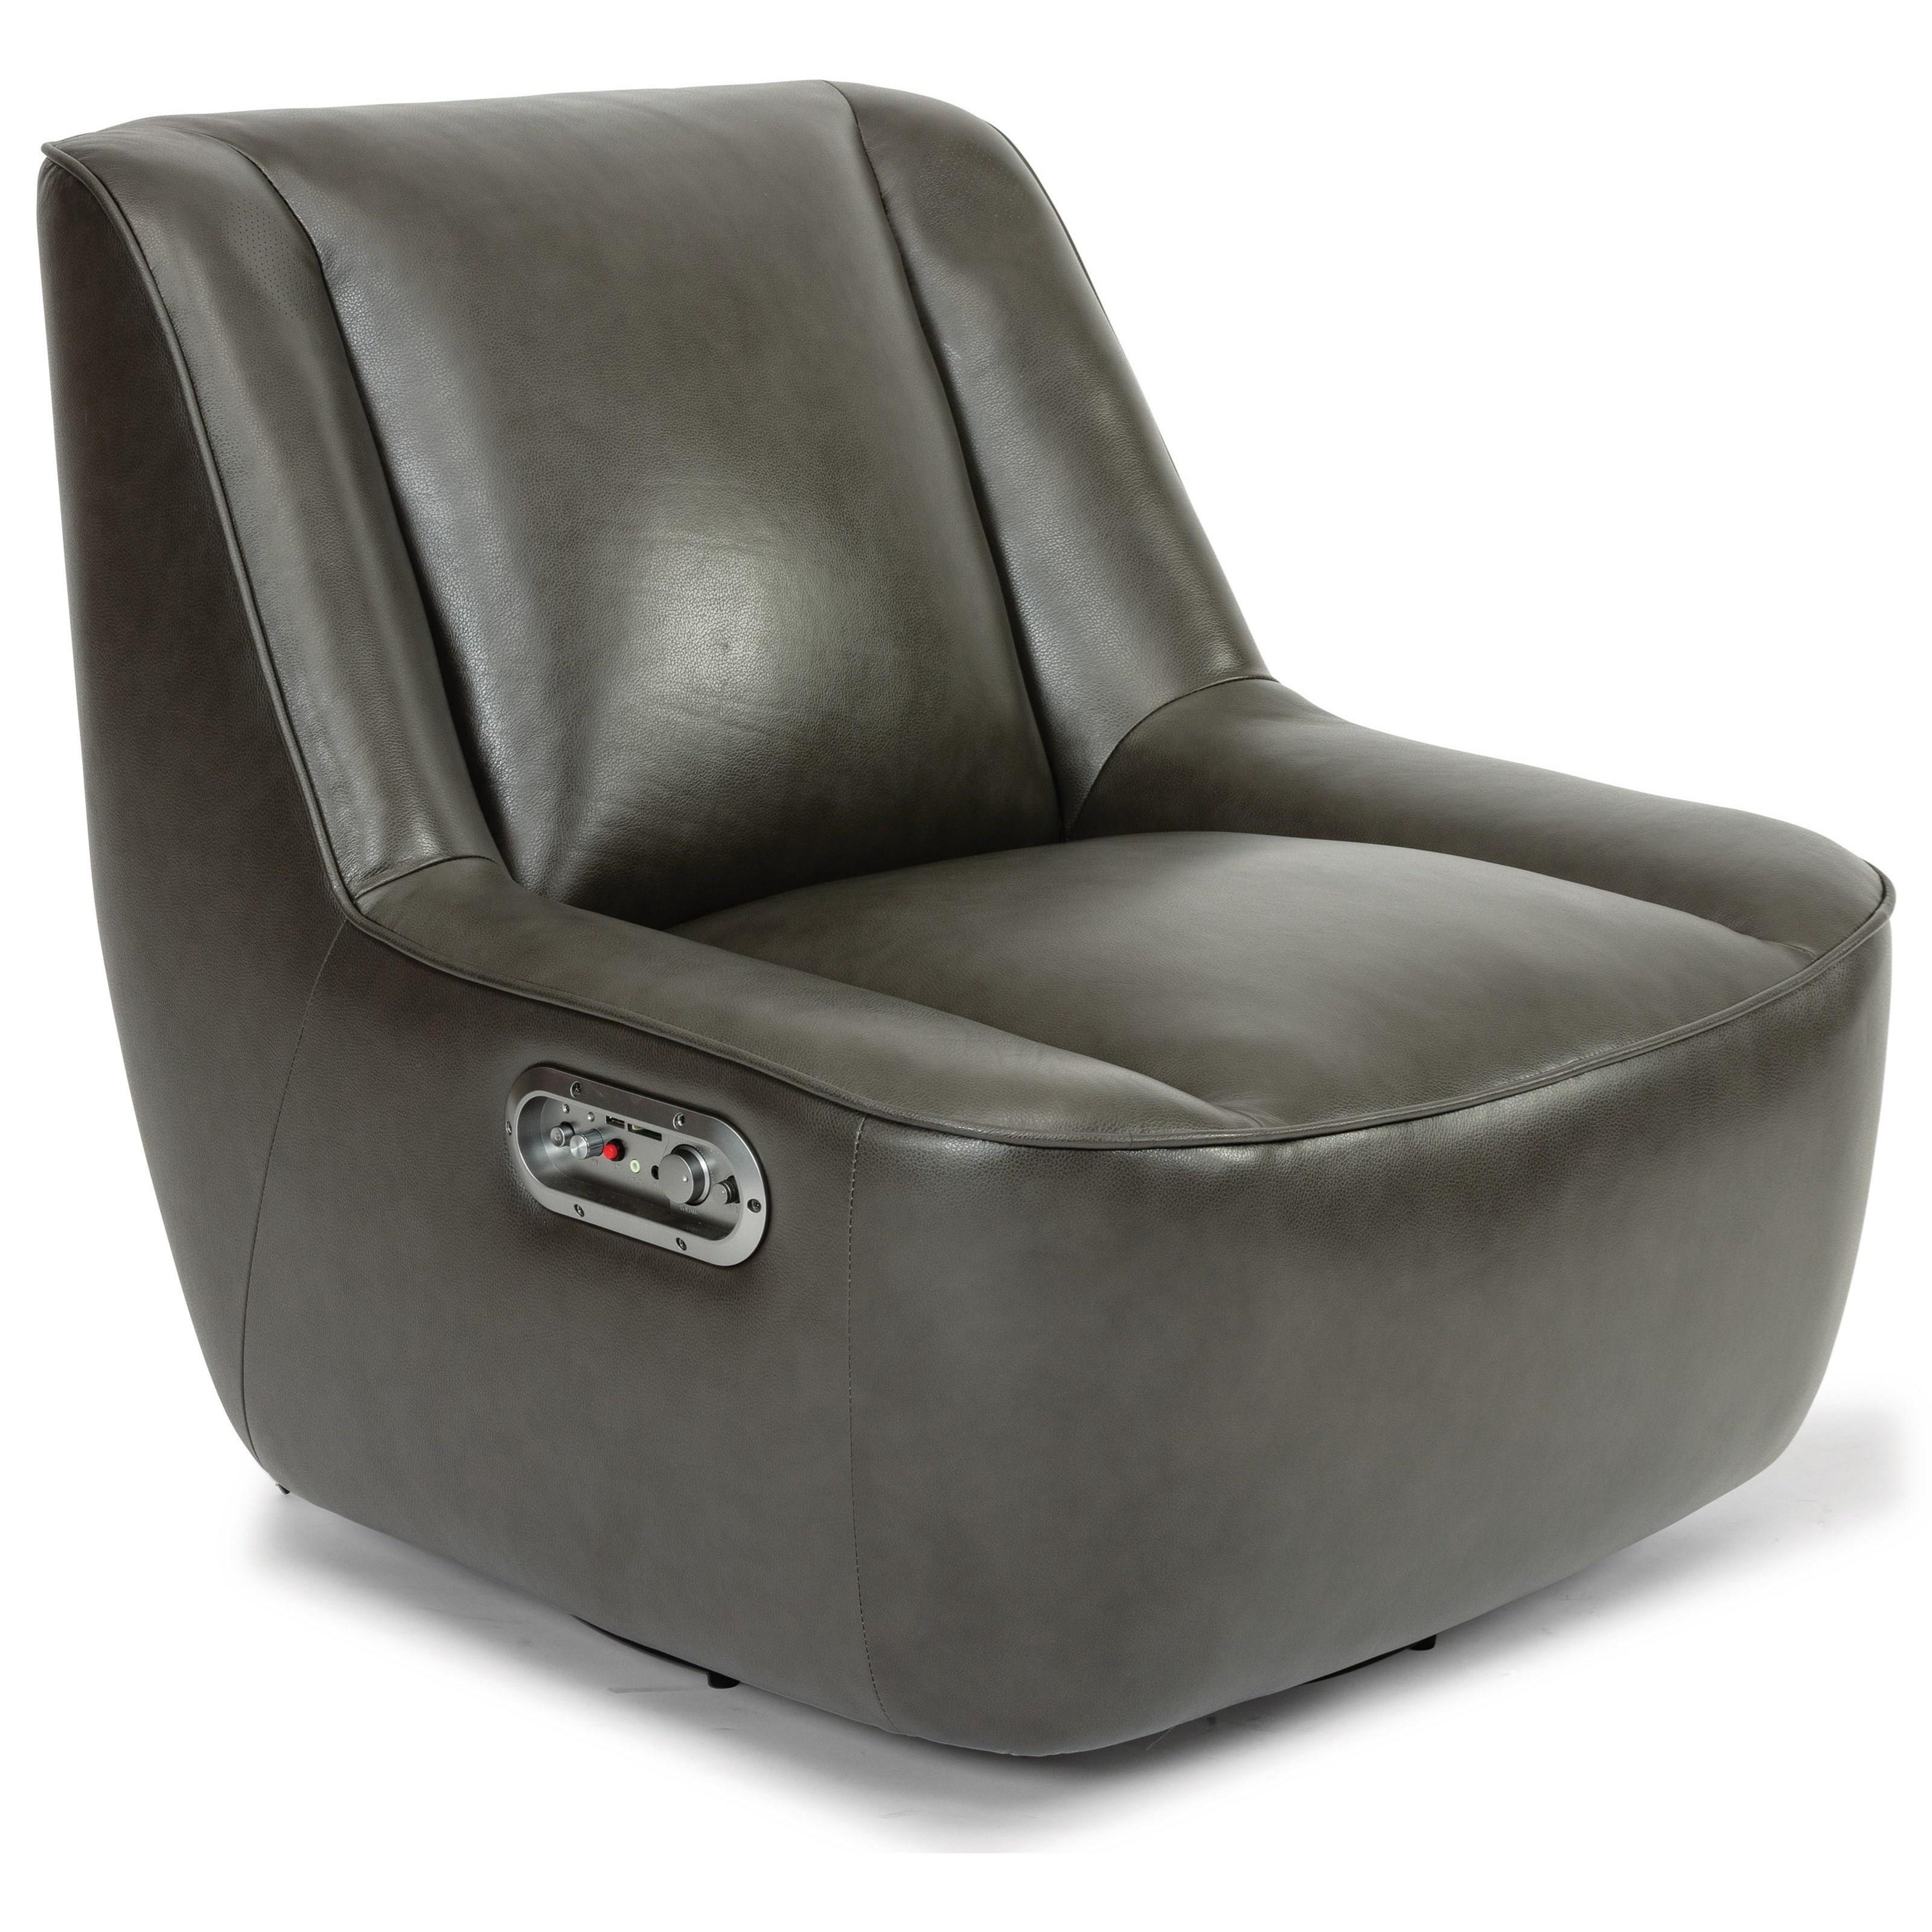 Latitudes - Status Gaming Chair  by Flexsteel at Walker's Furniture